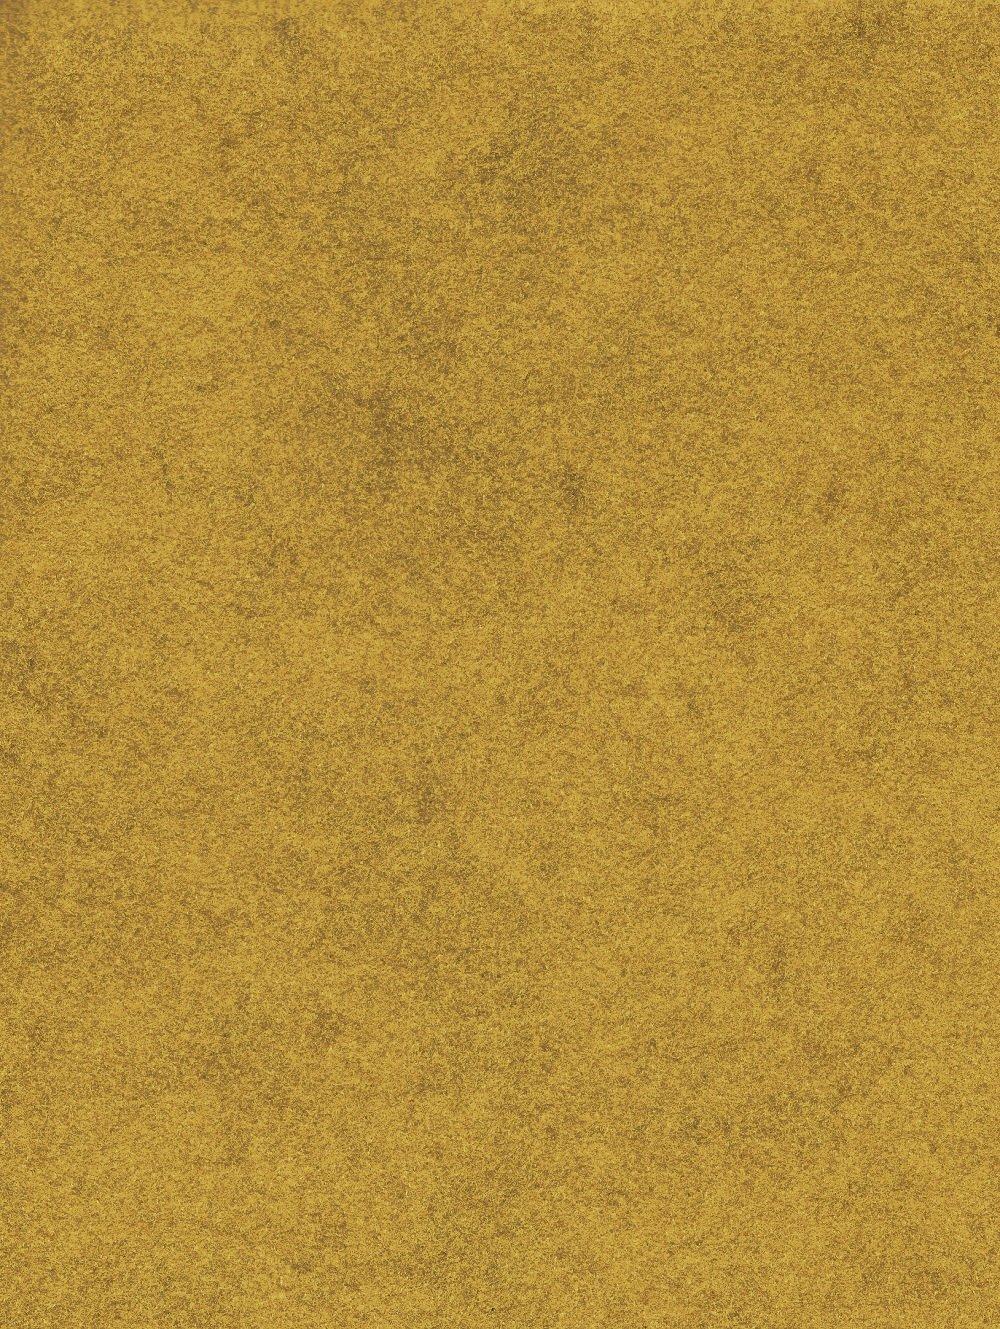 Honey Mustard - 12 x 18 Square